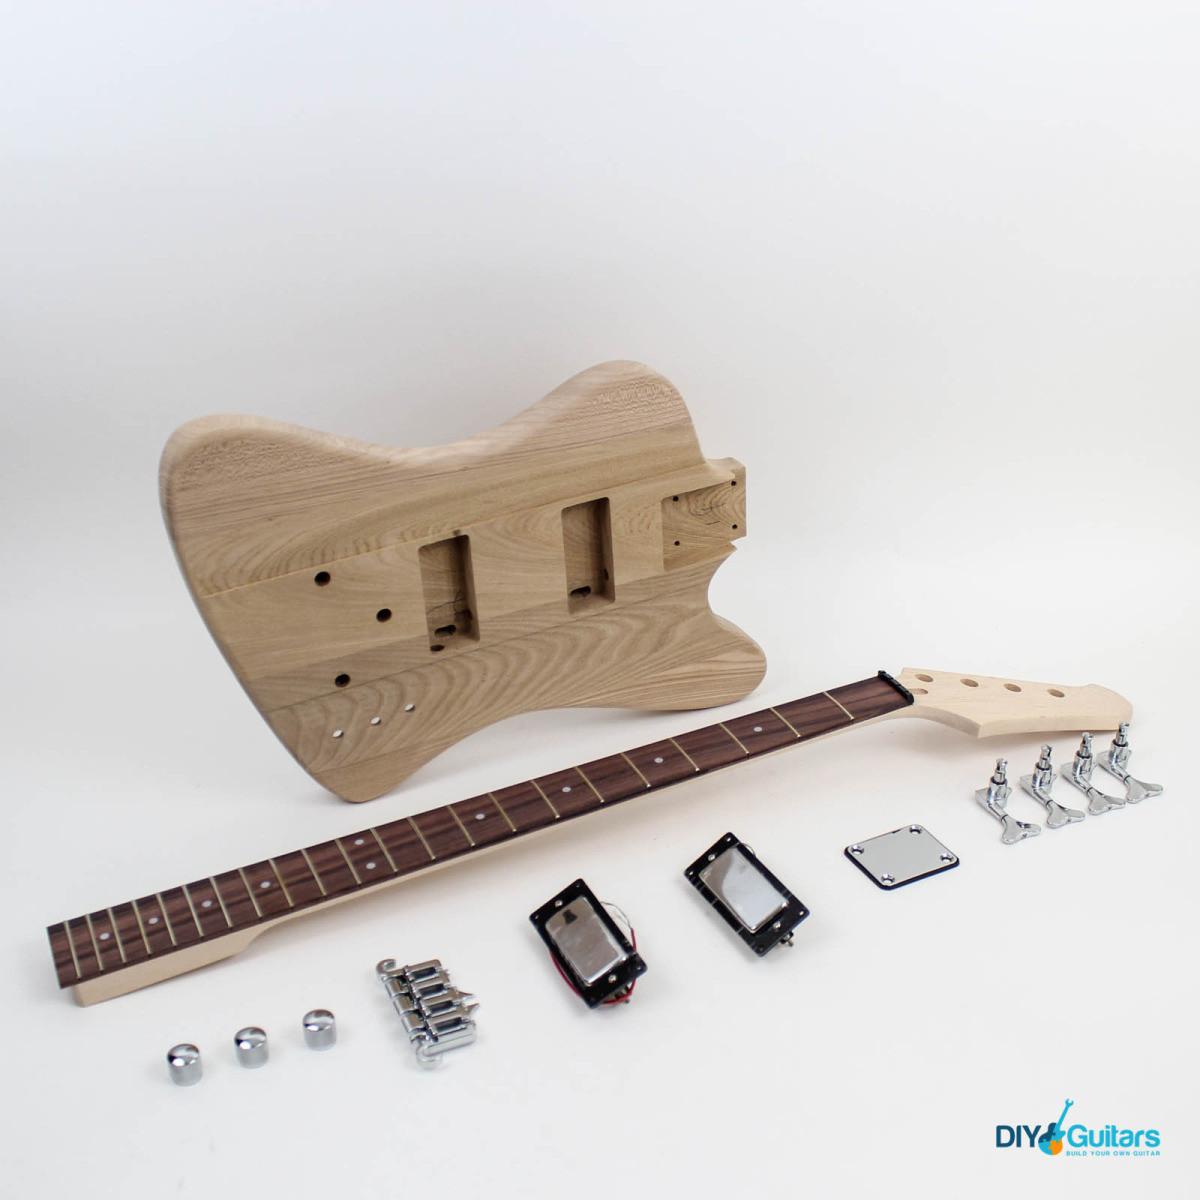 Best ideas about DIY Bass Kit . Save or Pin Gibson Thunderbird Style Bass Guitar Kit DIY Guitars Now.